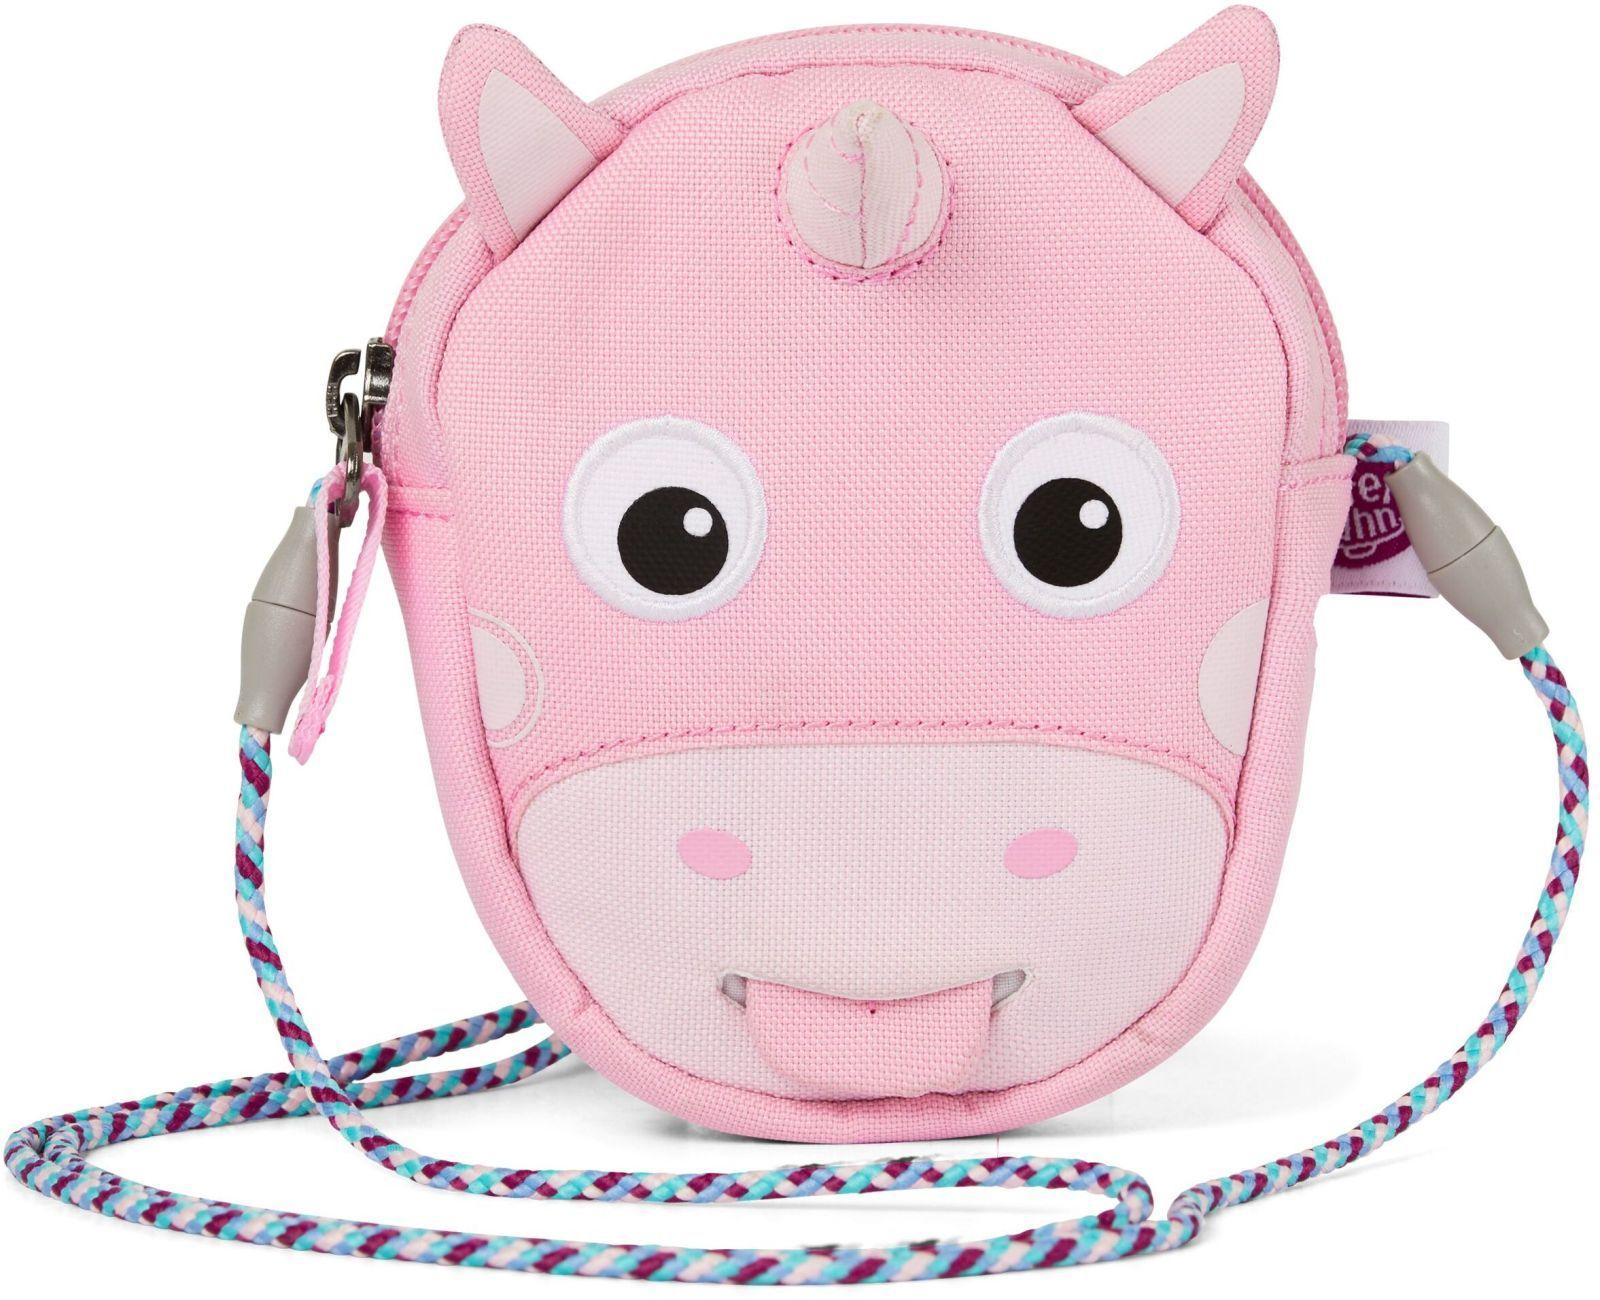 Barefoot Dětská kabelka Affenzahn Puse Ursula Unicorn-Pink bosá